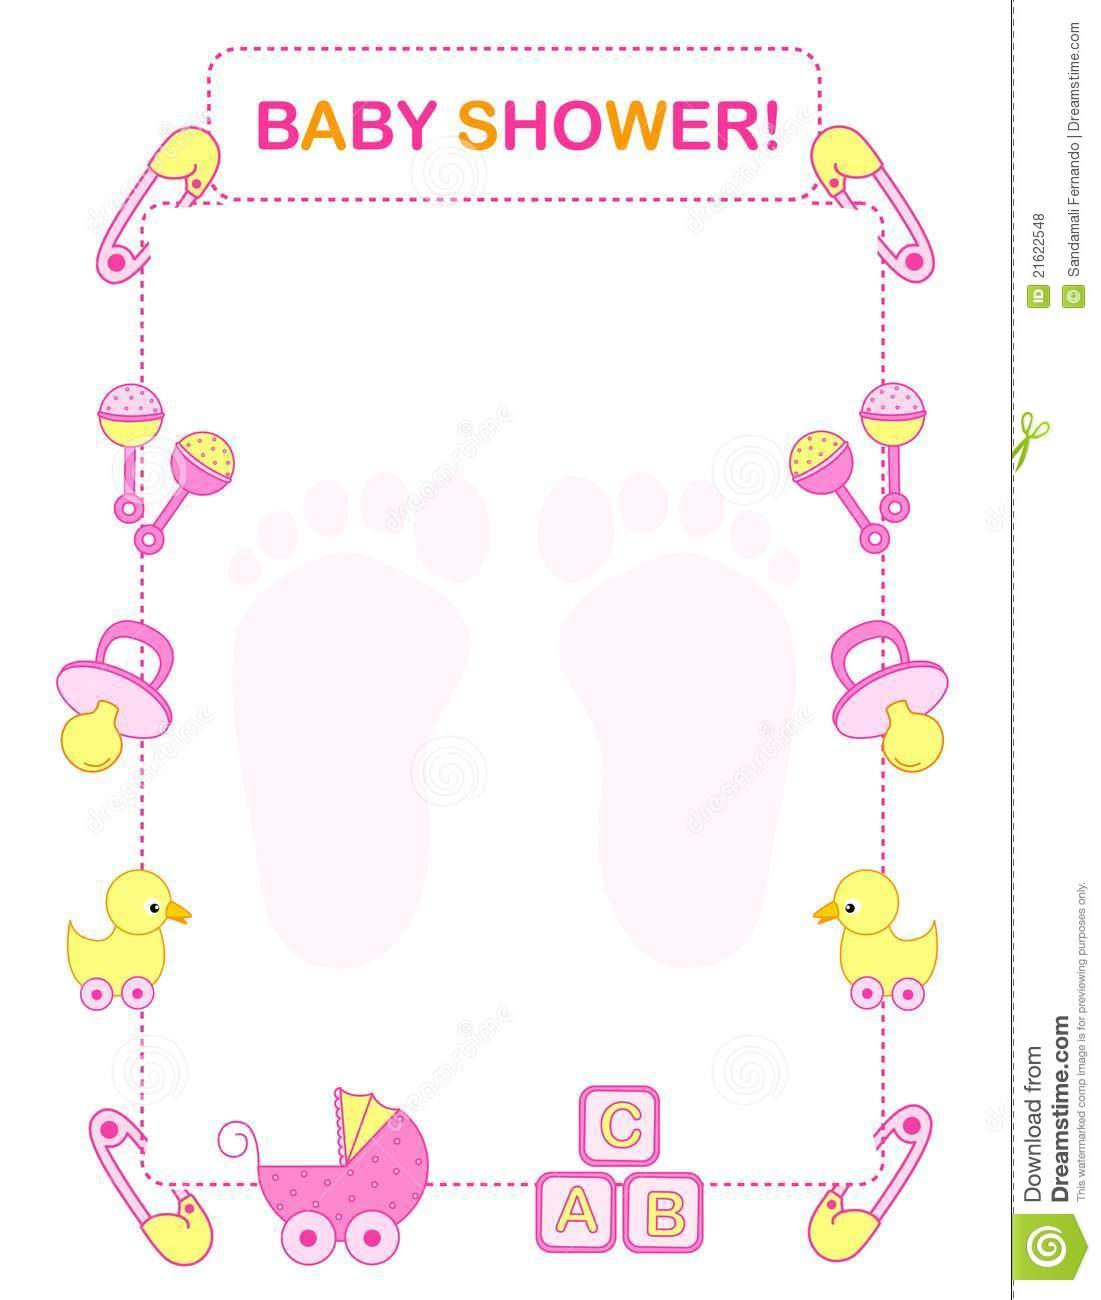 Printable Baby Boy Borders Free Download-Printable Baby Boy Borders Free Download Baby Shower Invitations-16